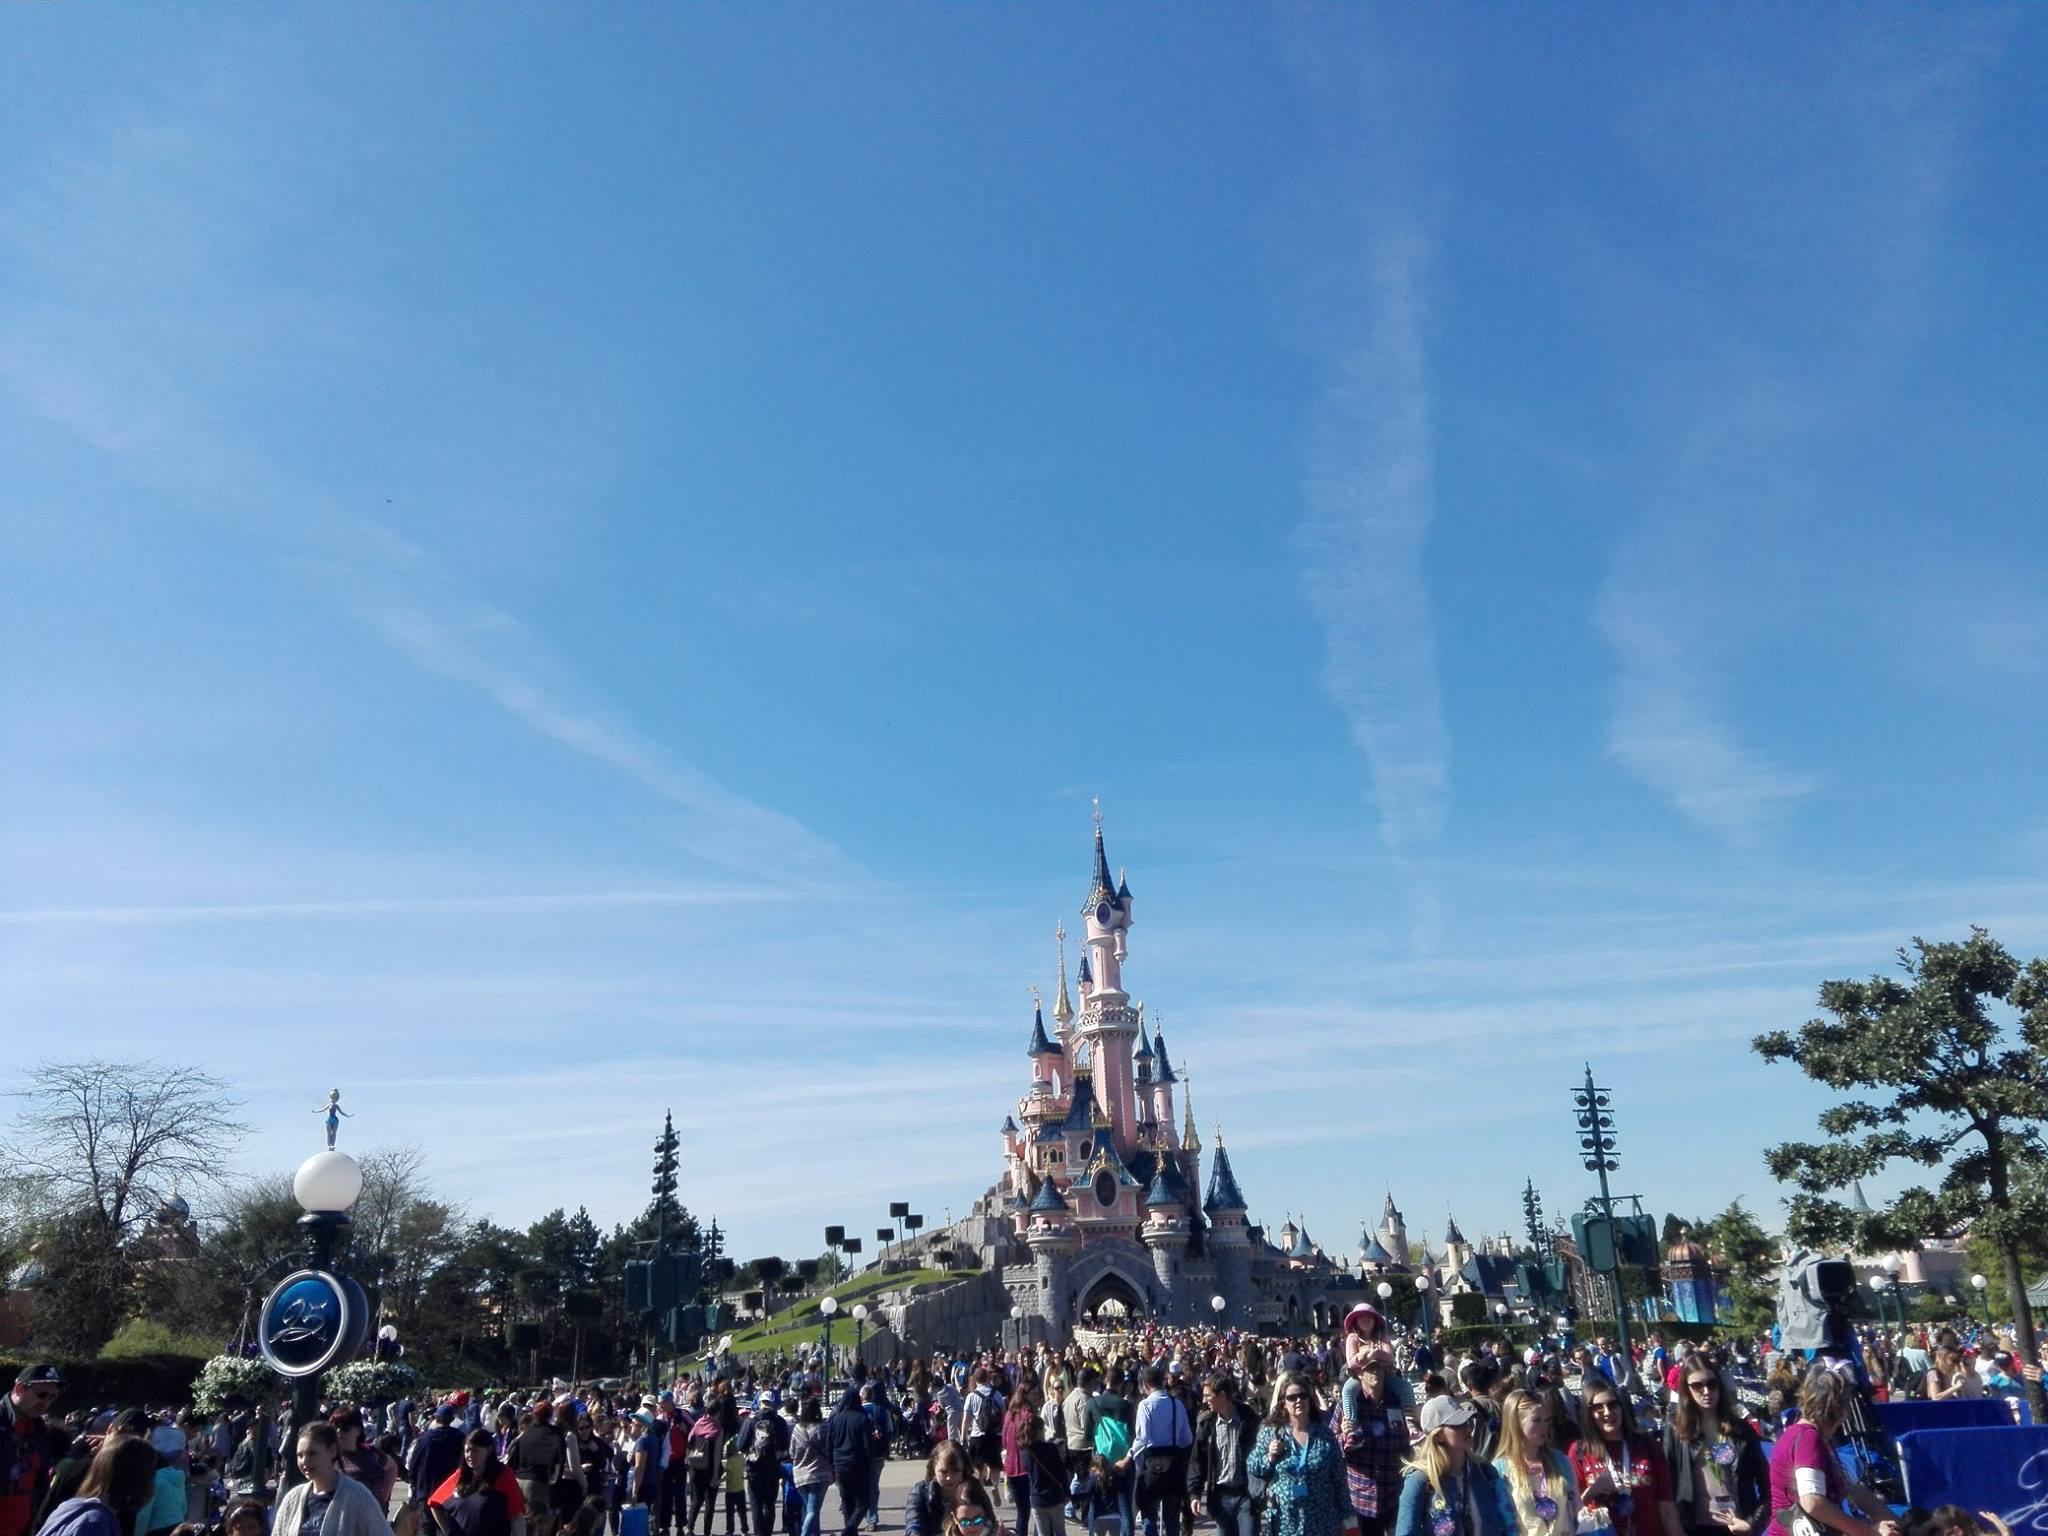 25 ans de Disneyland Paris - 12 avril 2017